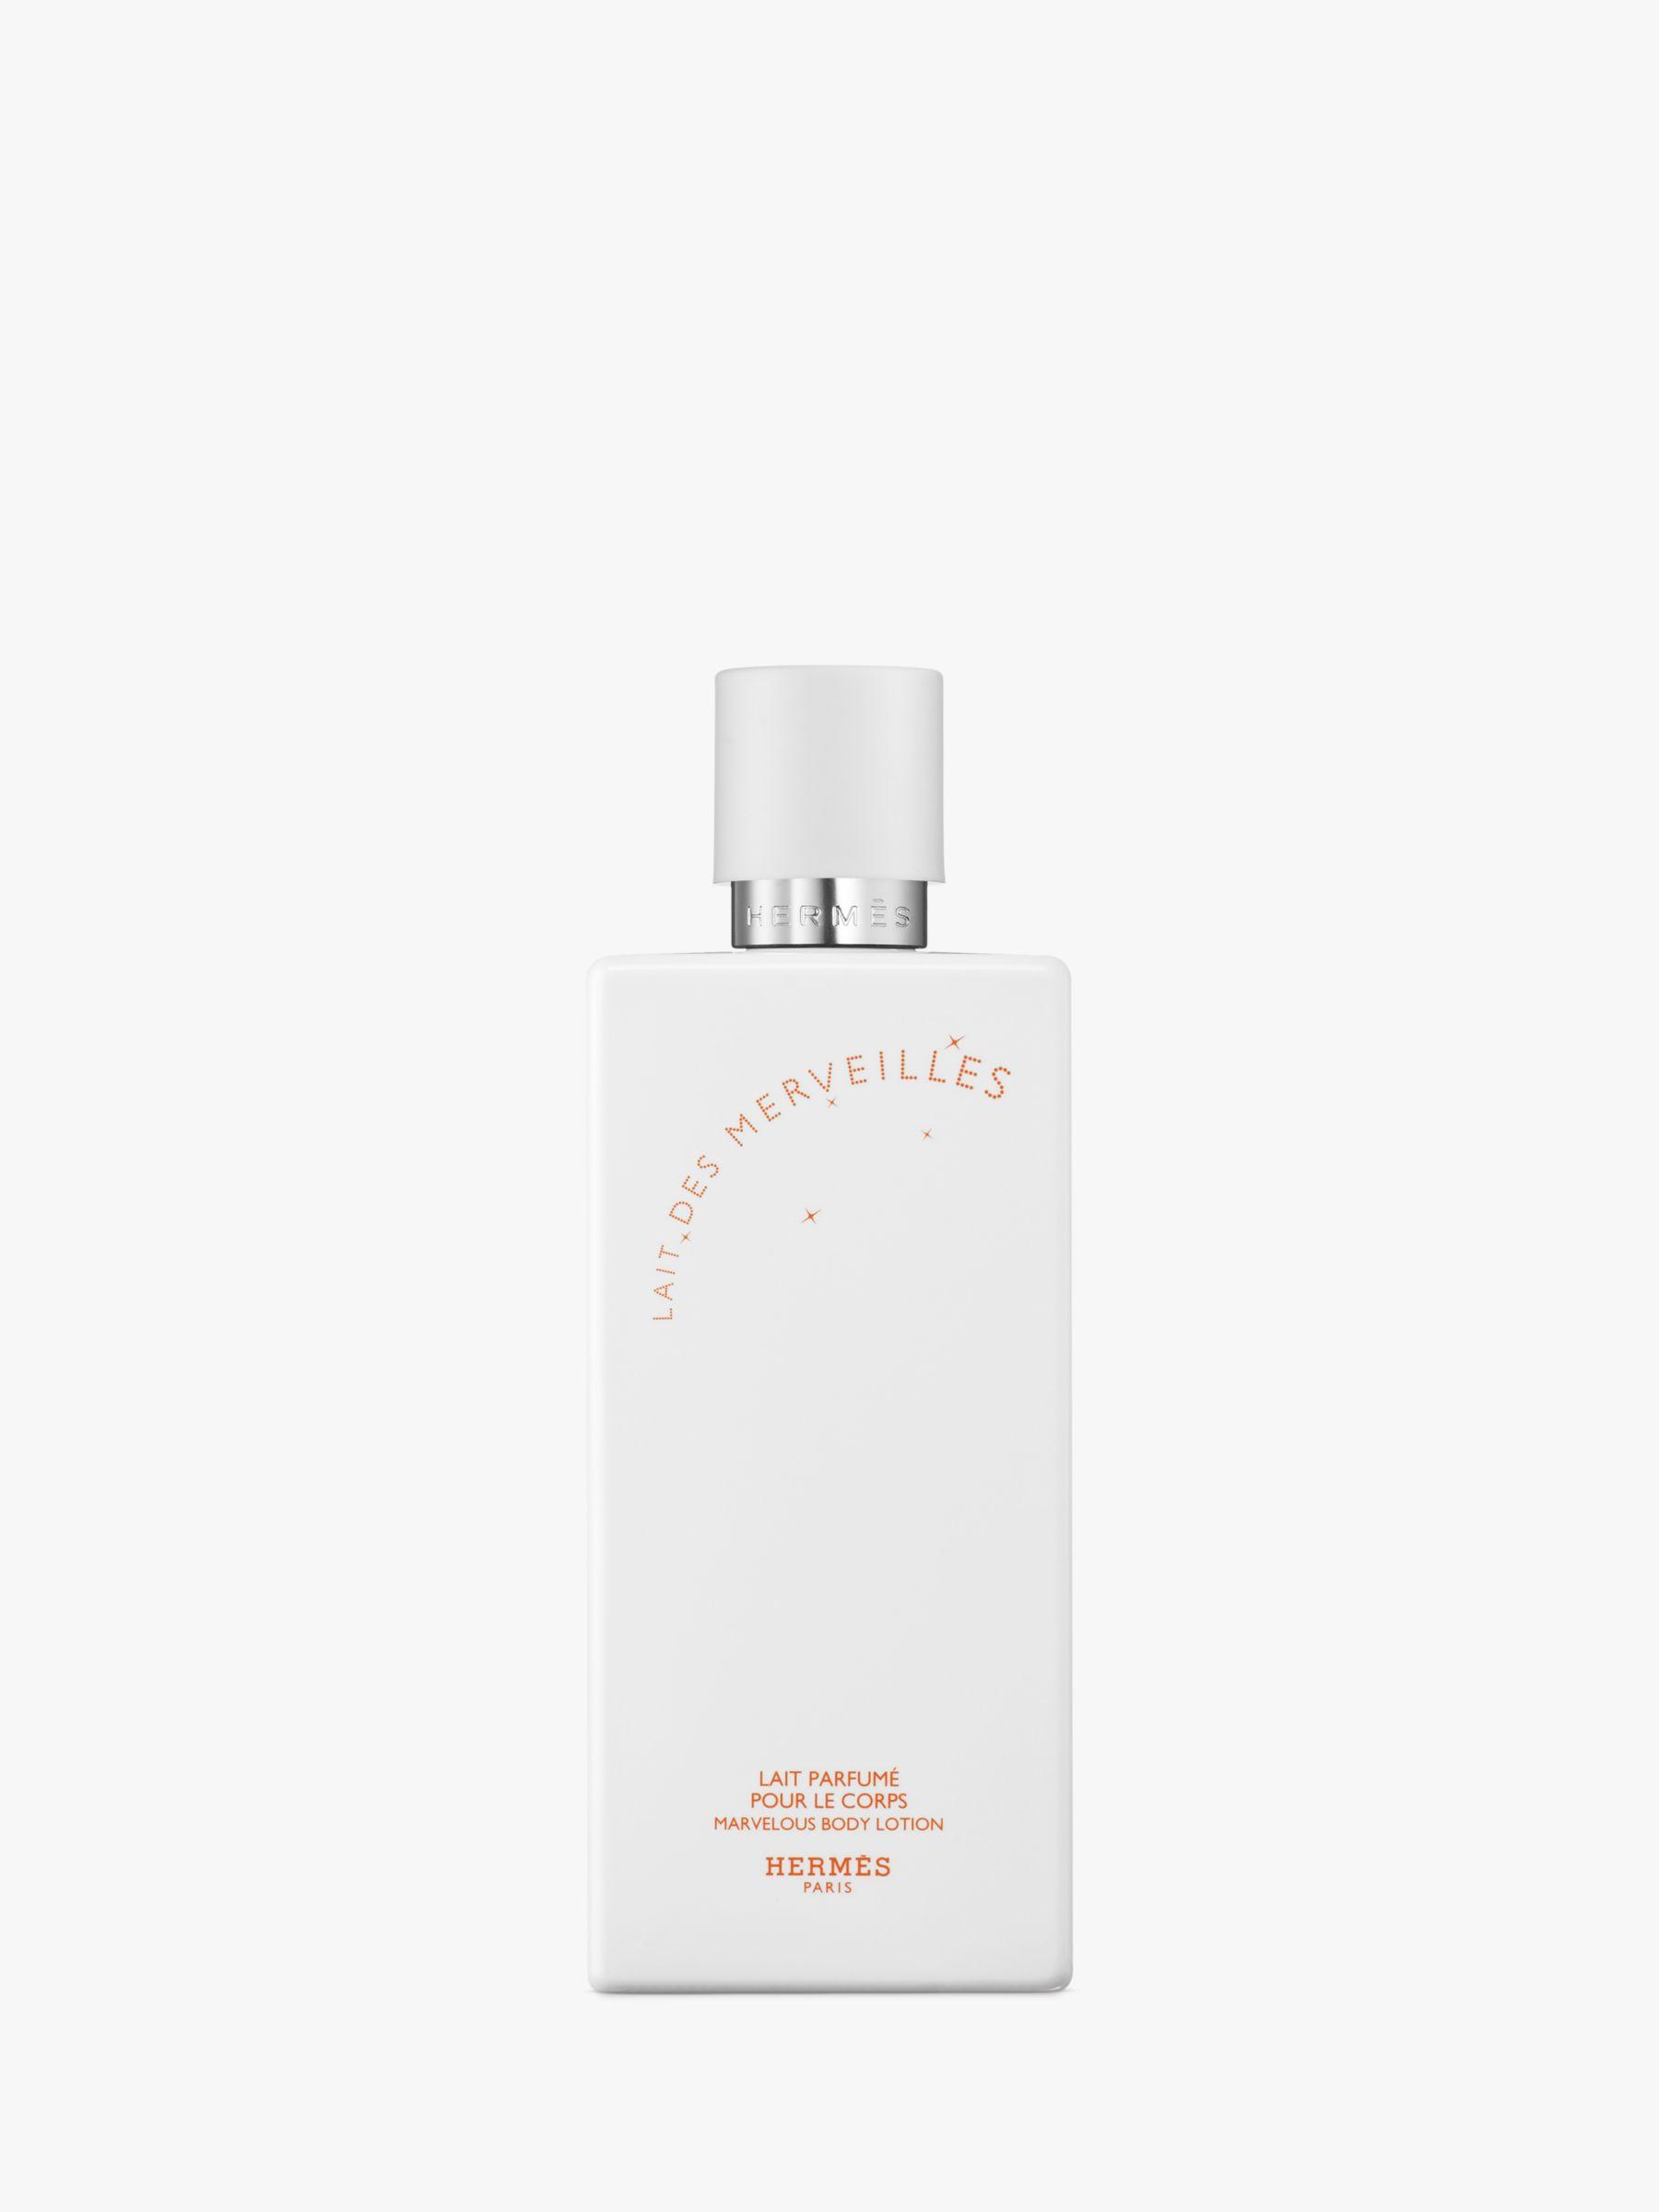 Hermes HERMÈS Eau Des Merveilles Perfumed Body Lotion, 200ml